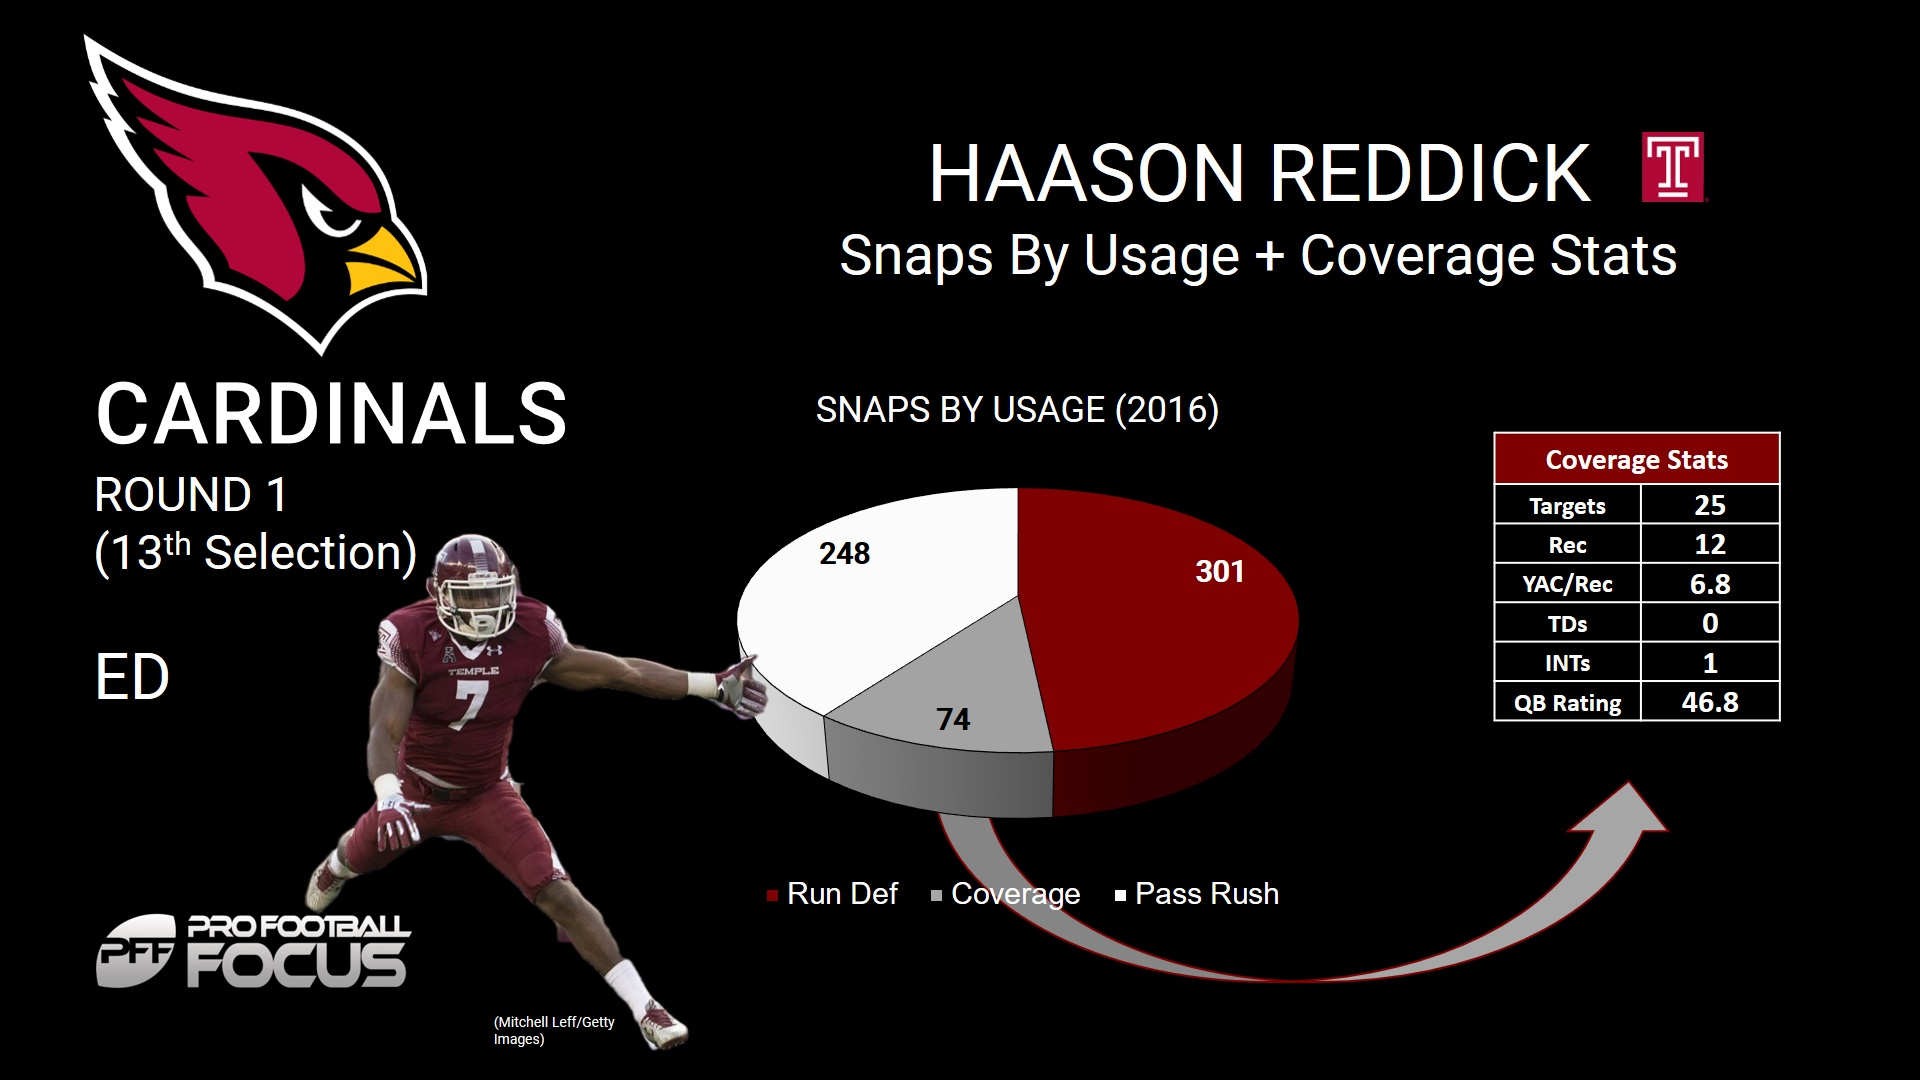 Haason Reddick 1